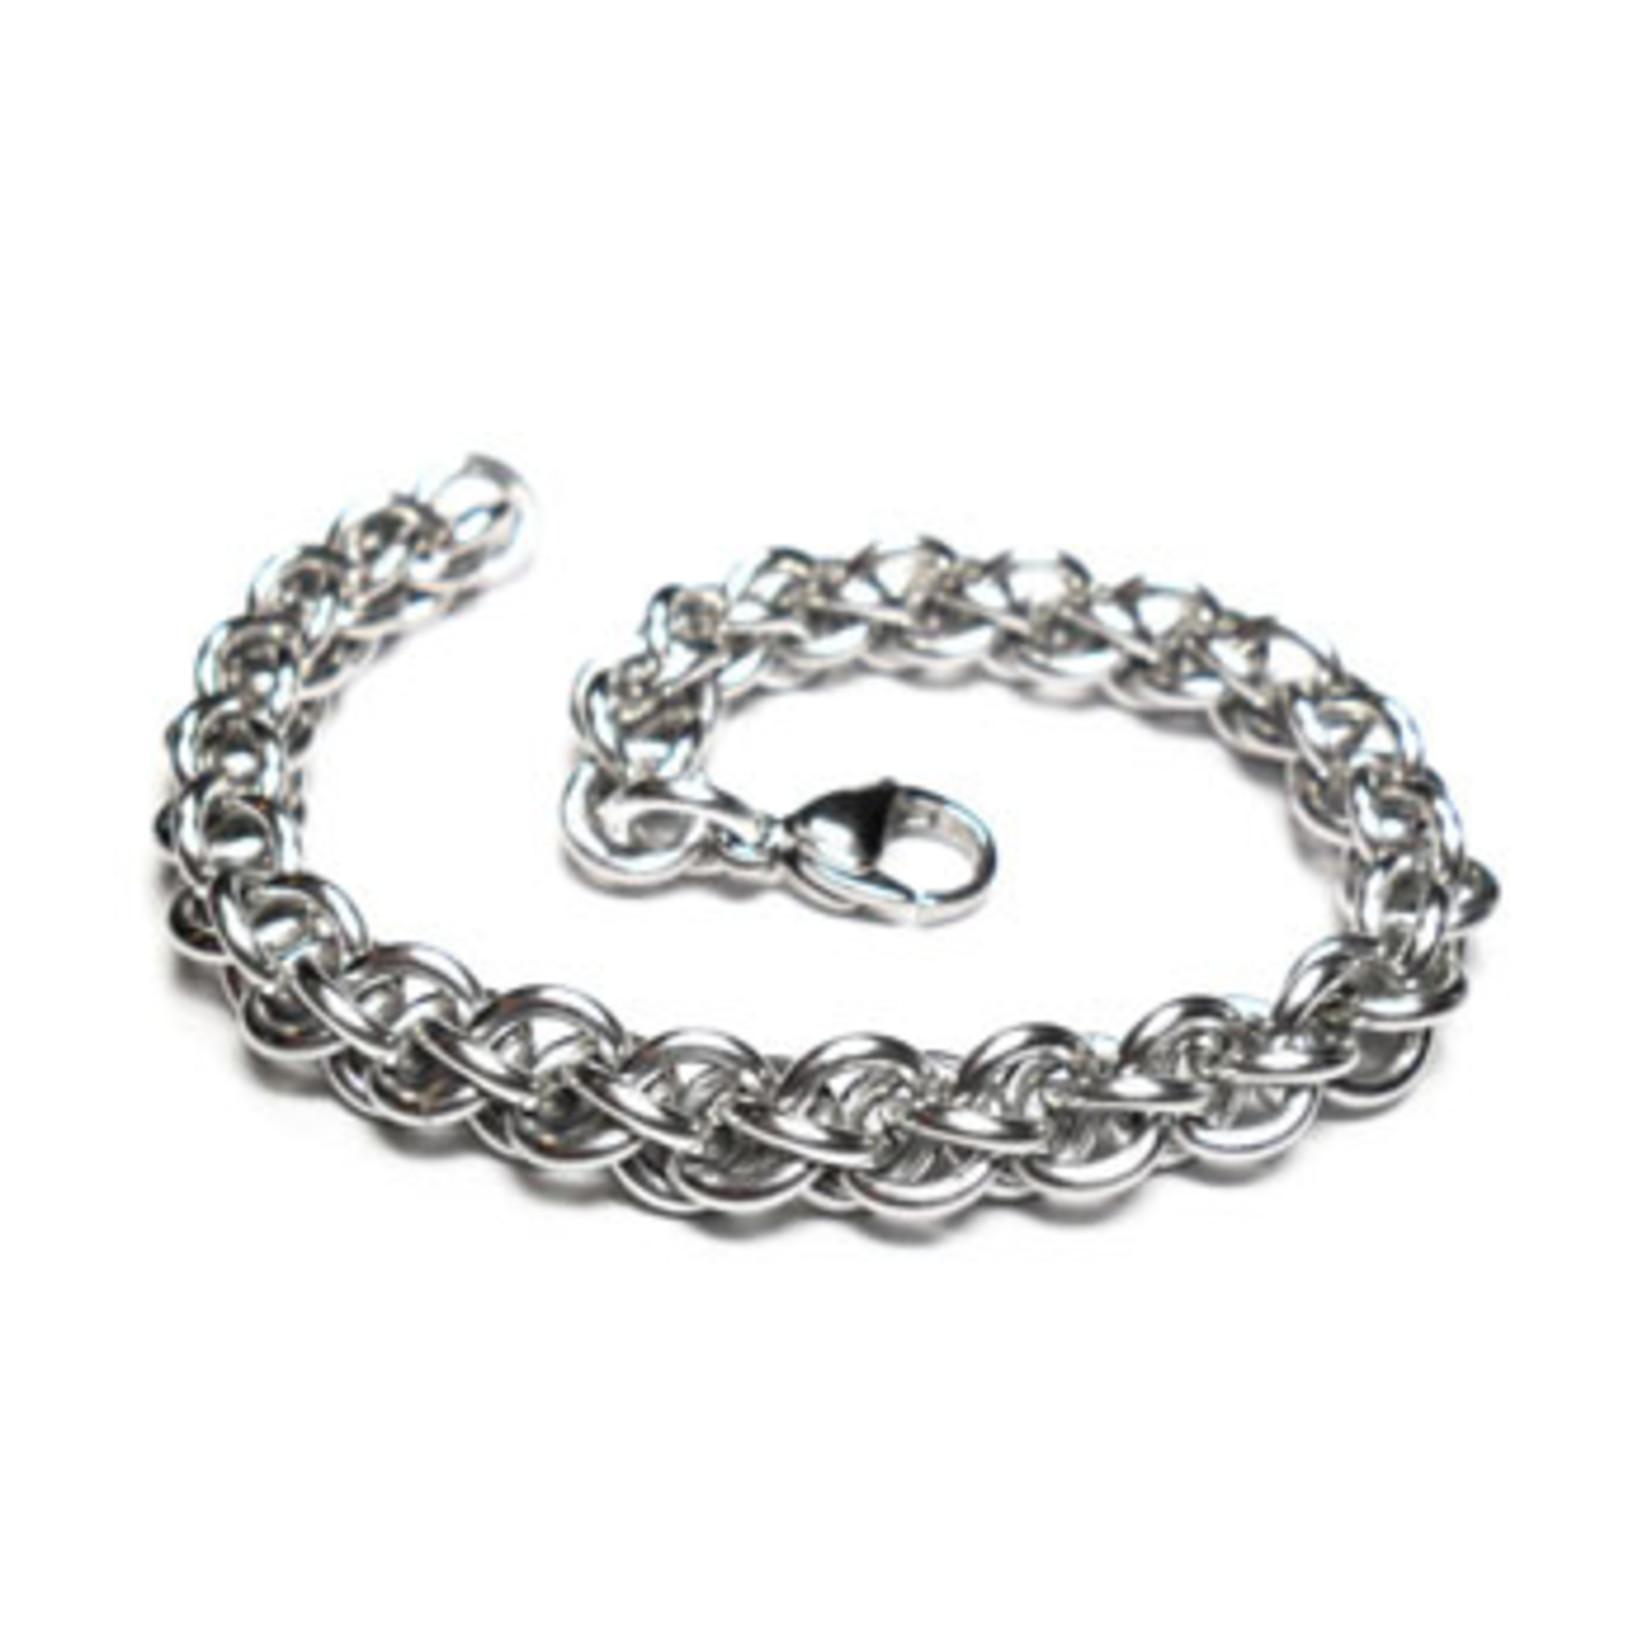 Hyperlinks Chain Maille Jens Pind Linkage (JPL) Bracelet Kit